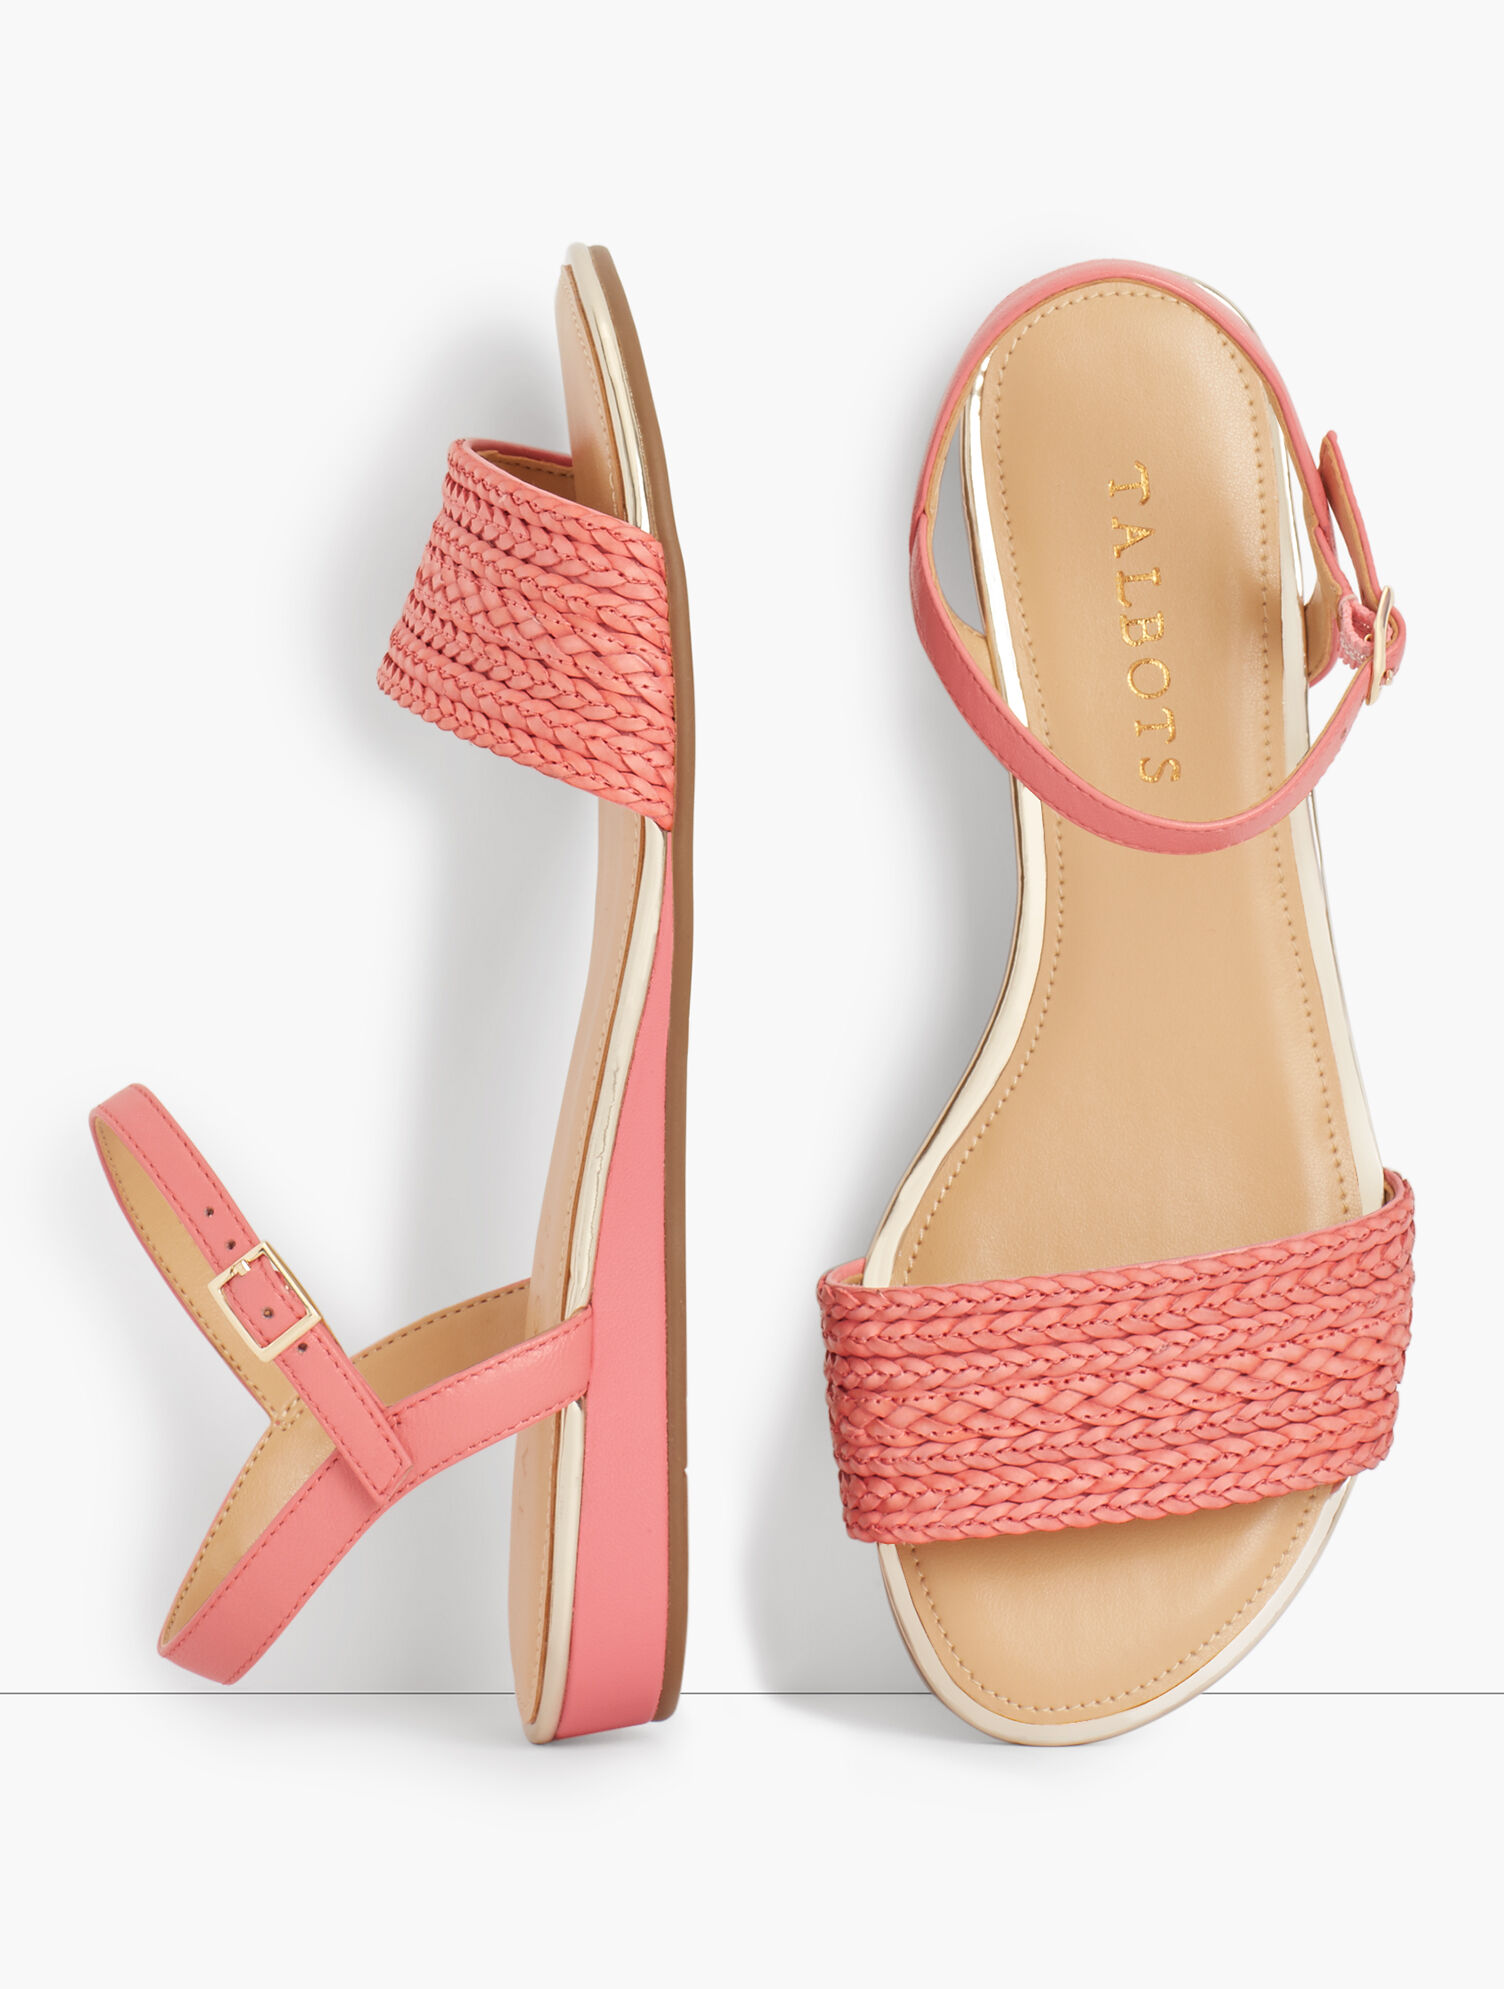 Daisy Micro-Wedge Sandals - Braided